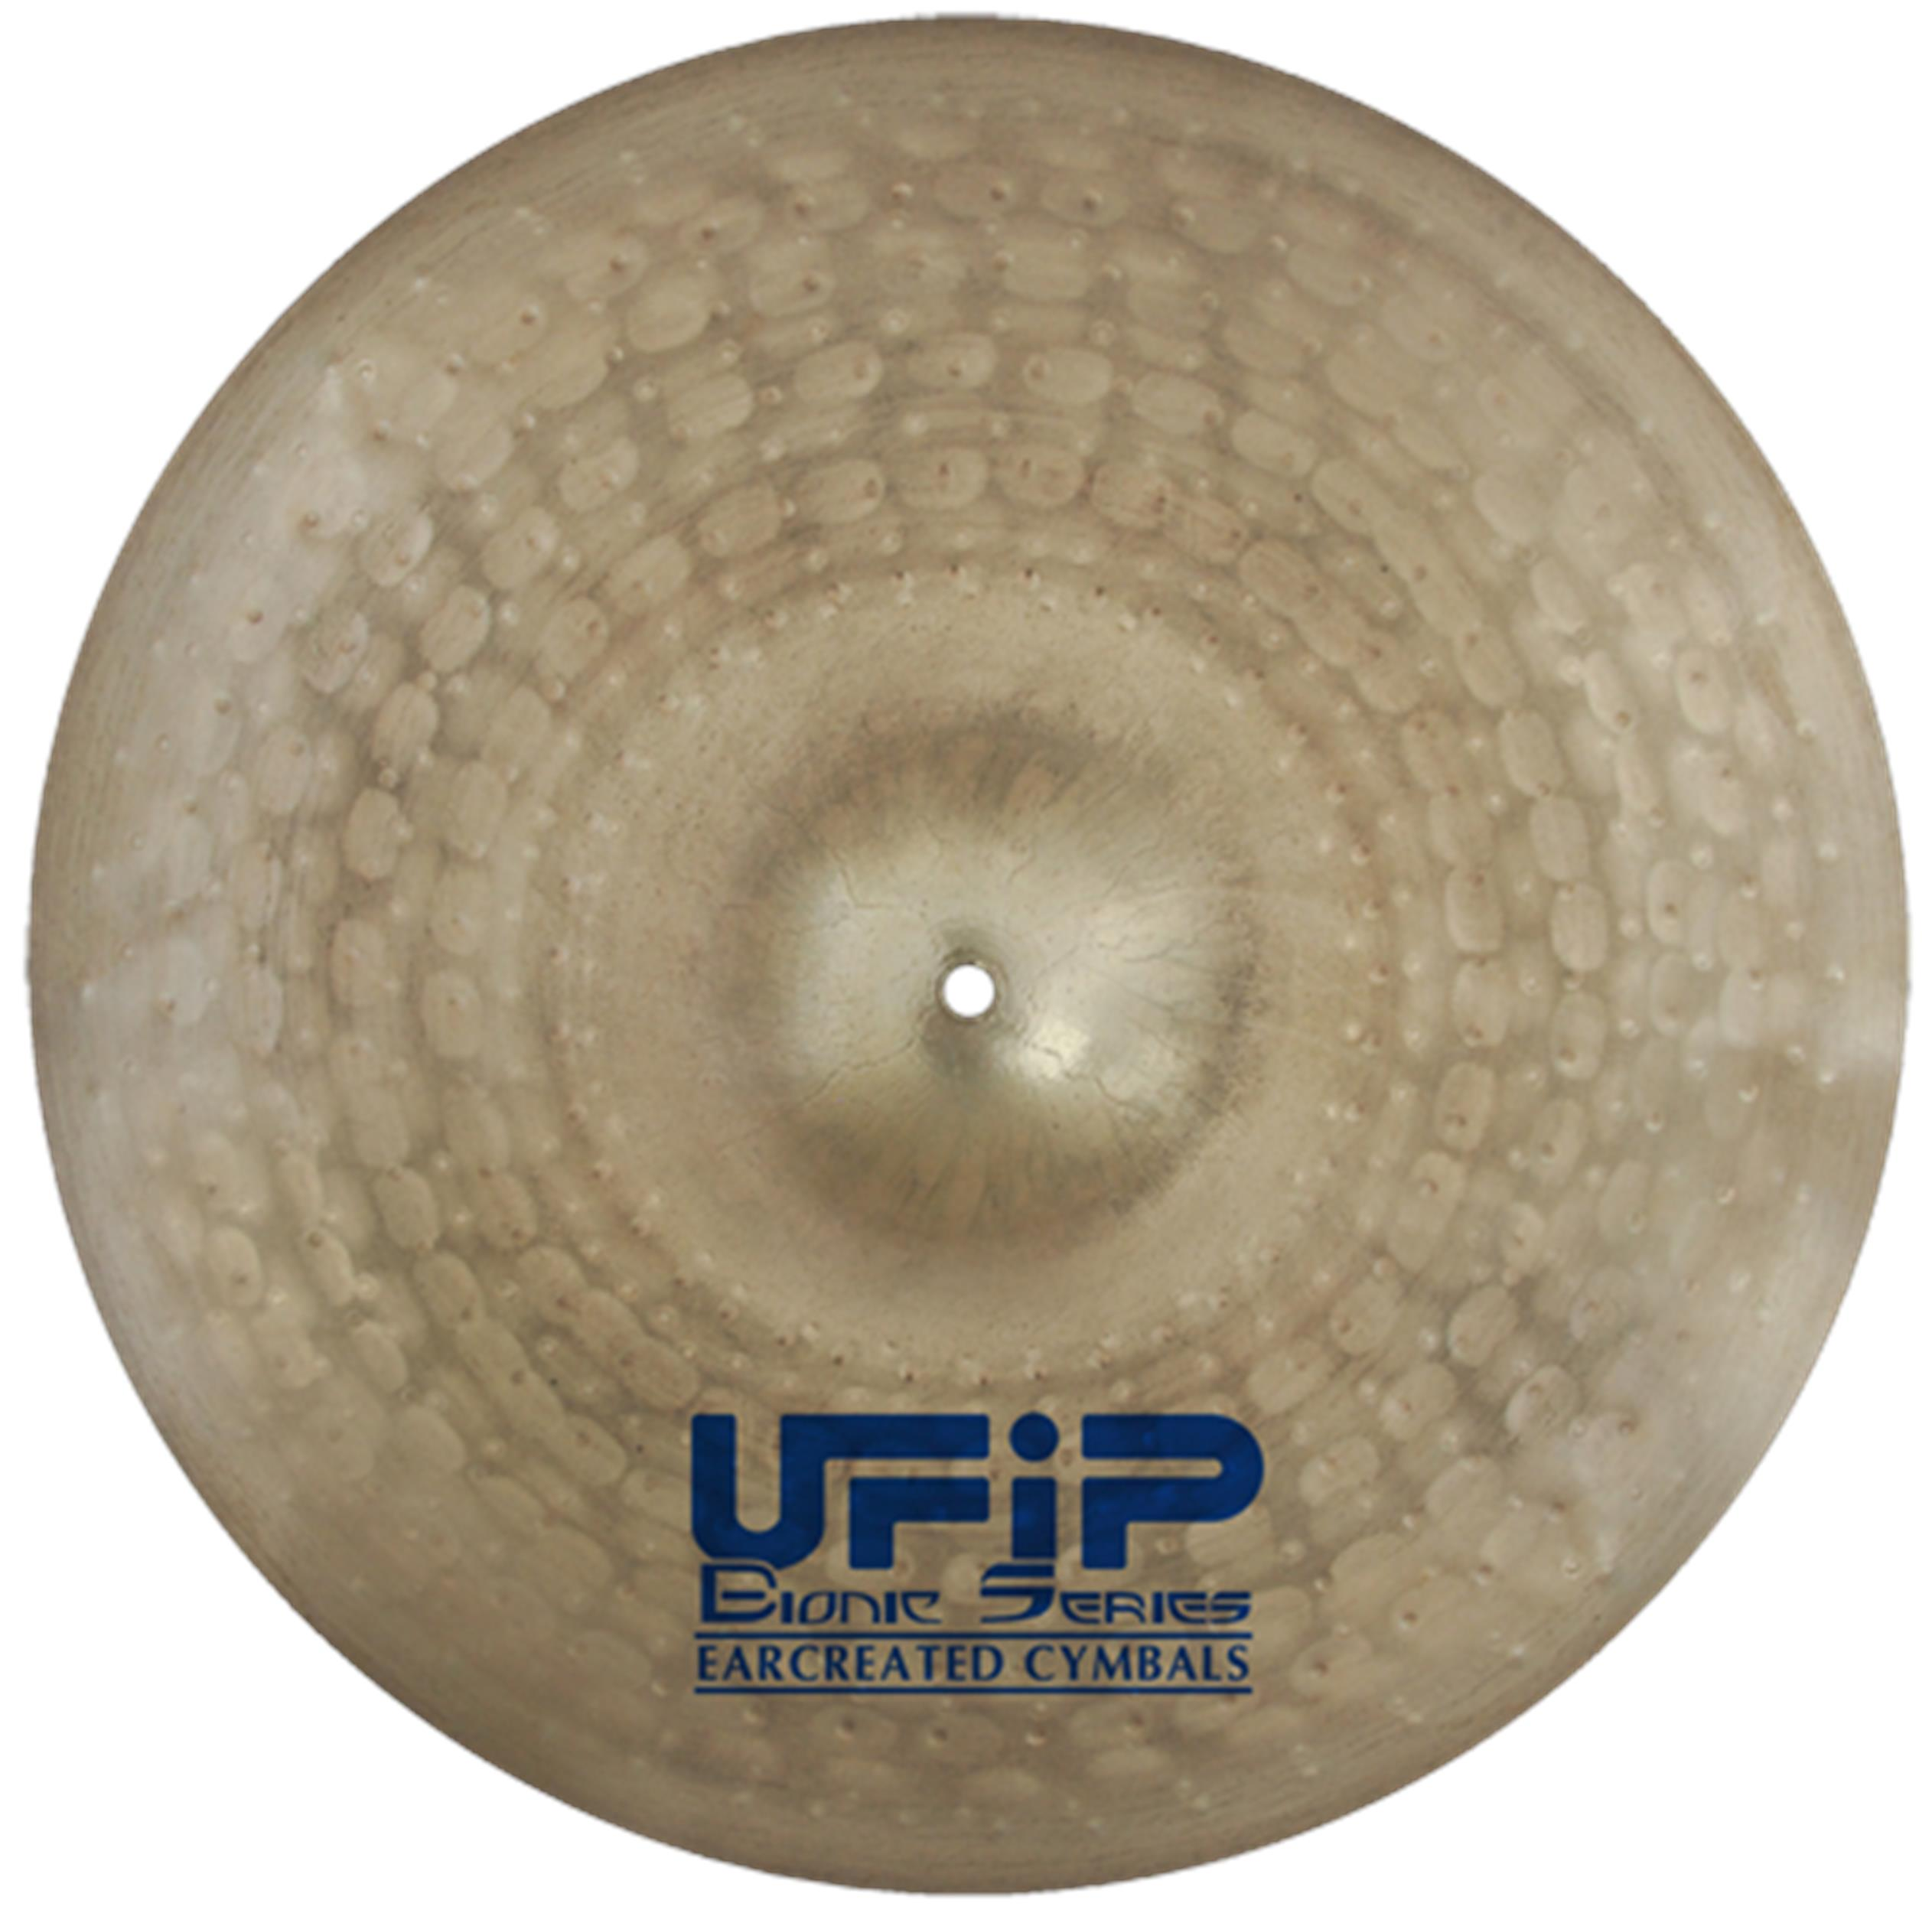 UFIP-BI-21MR-Bionic-Series-21-Medium-Ride-sku-45600013